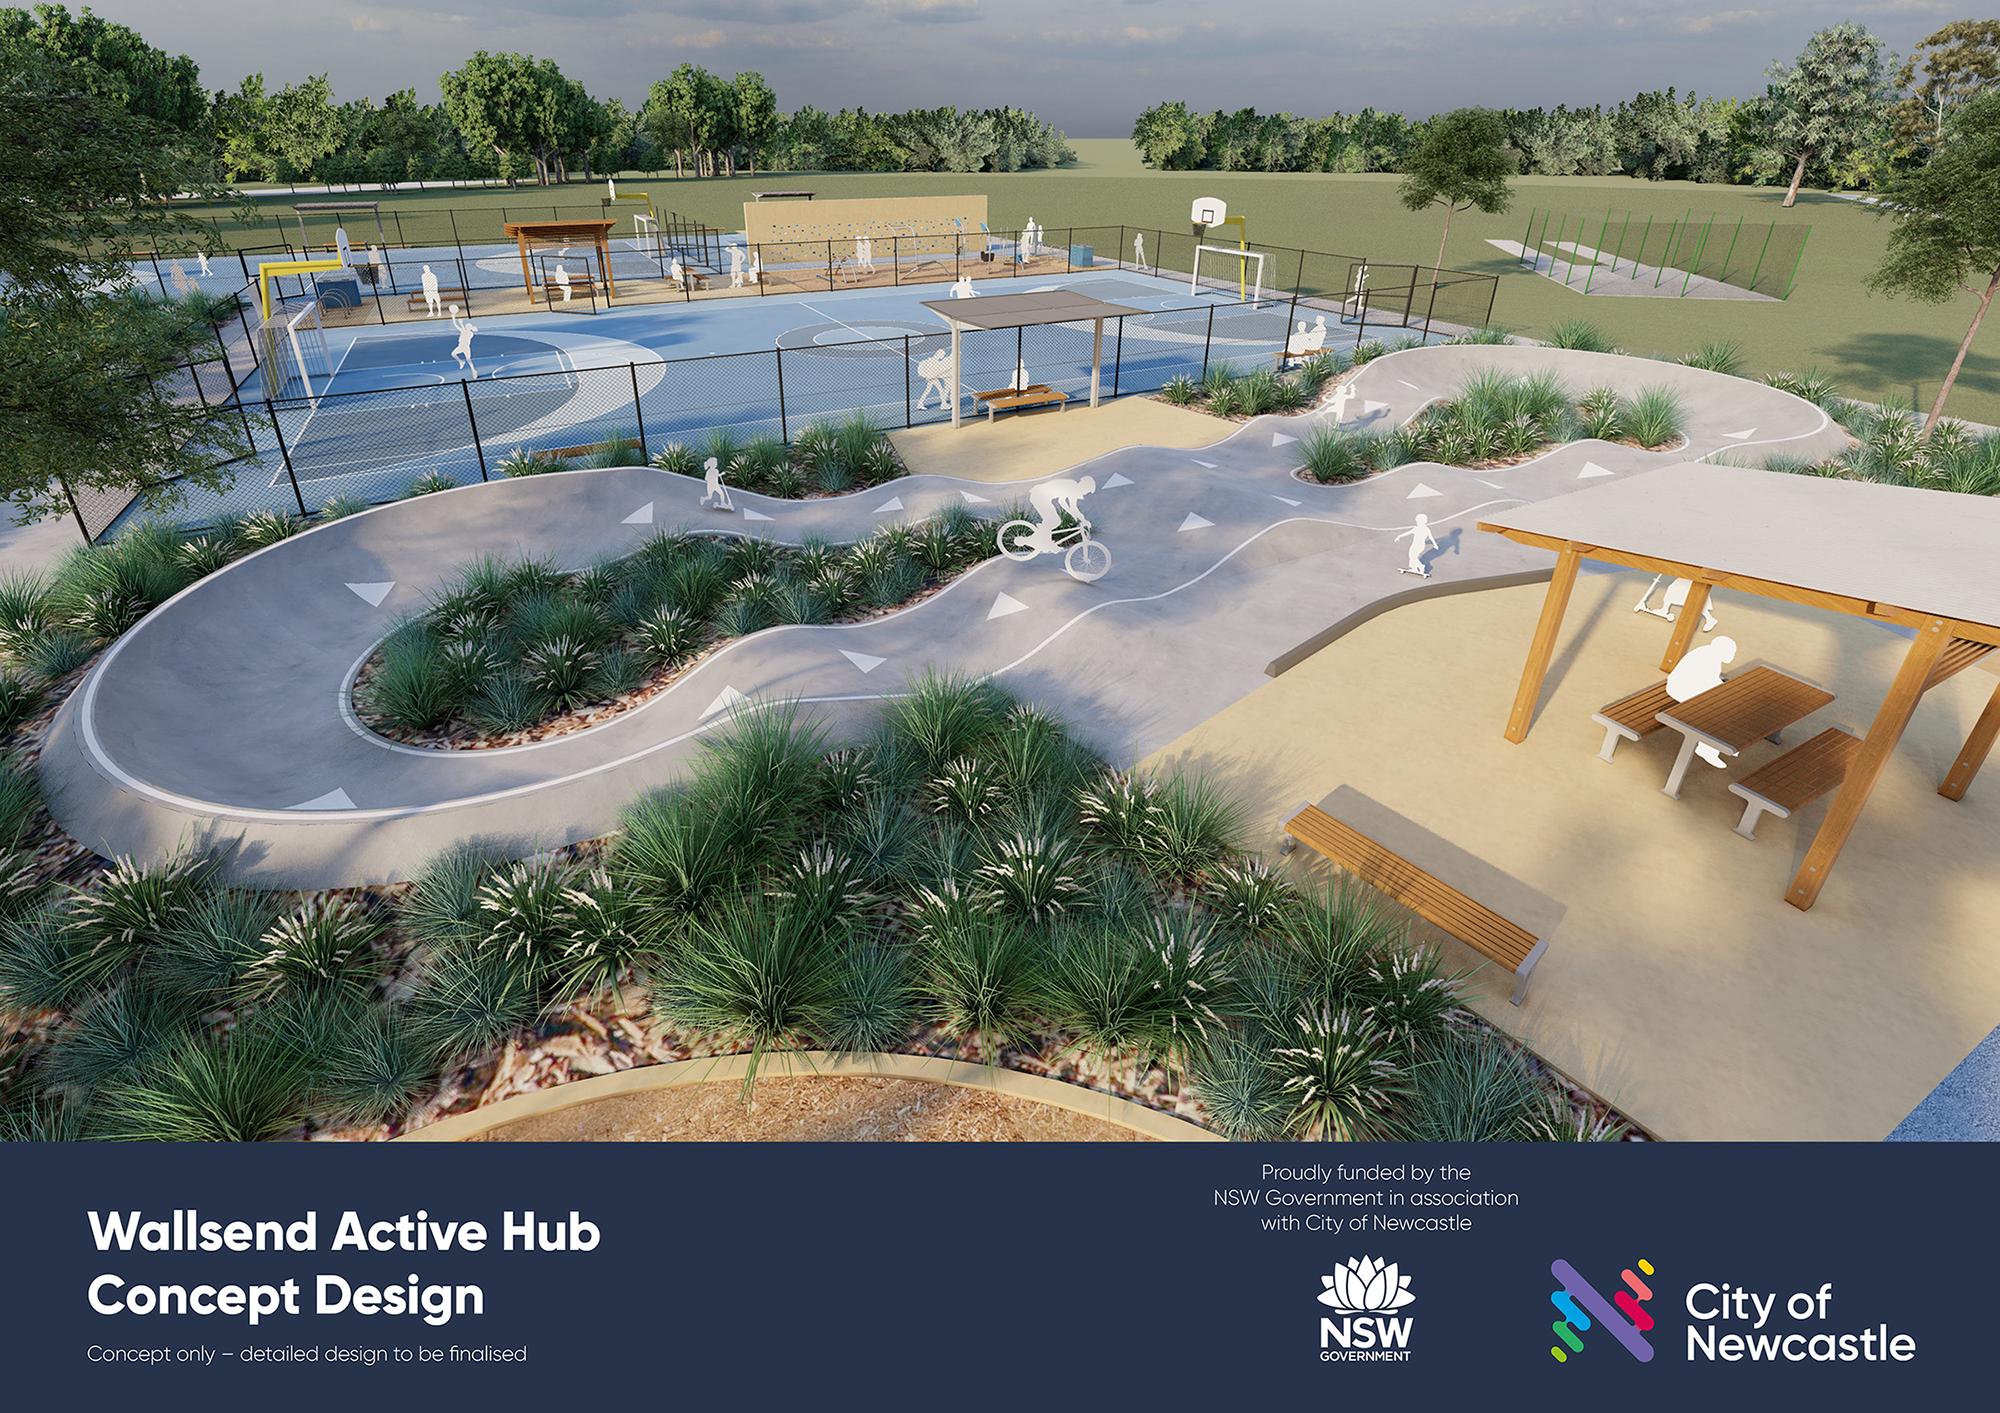 Wallsend-Active-Hub-concept-design-2.jpg